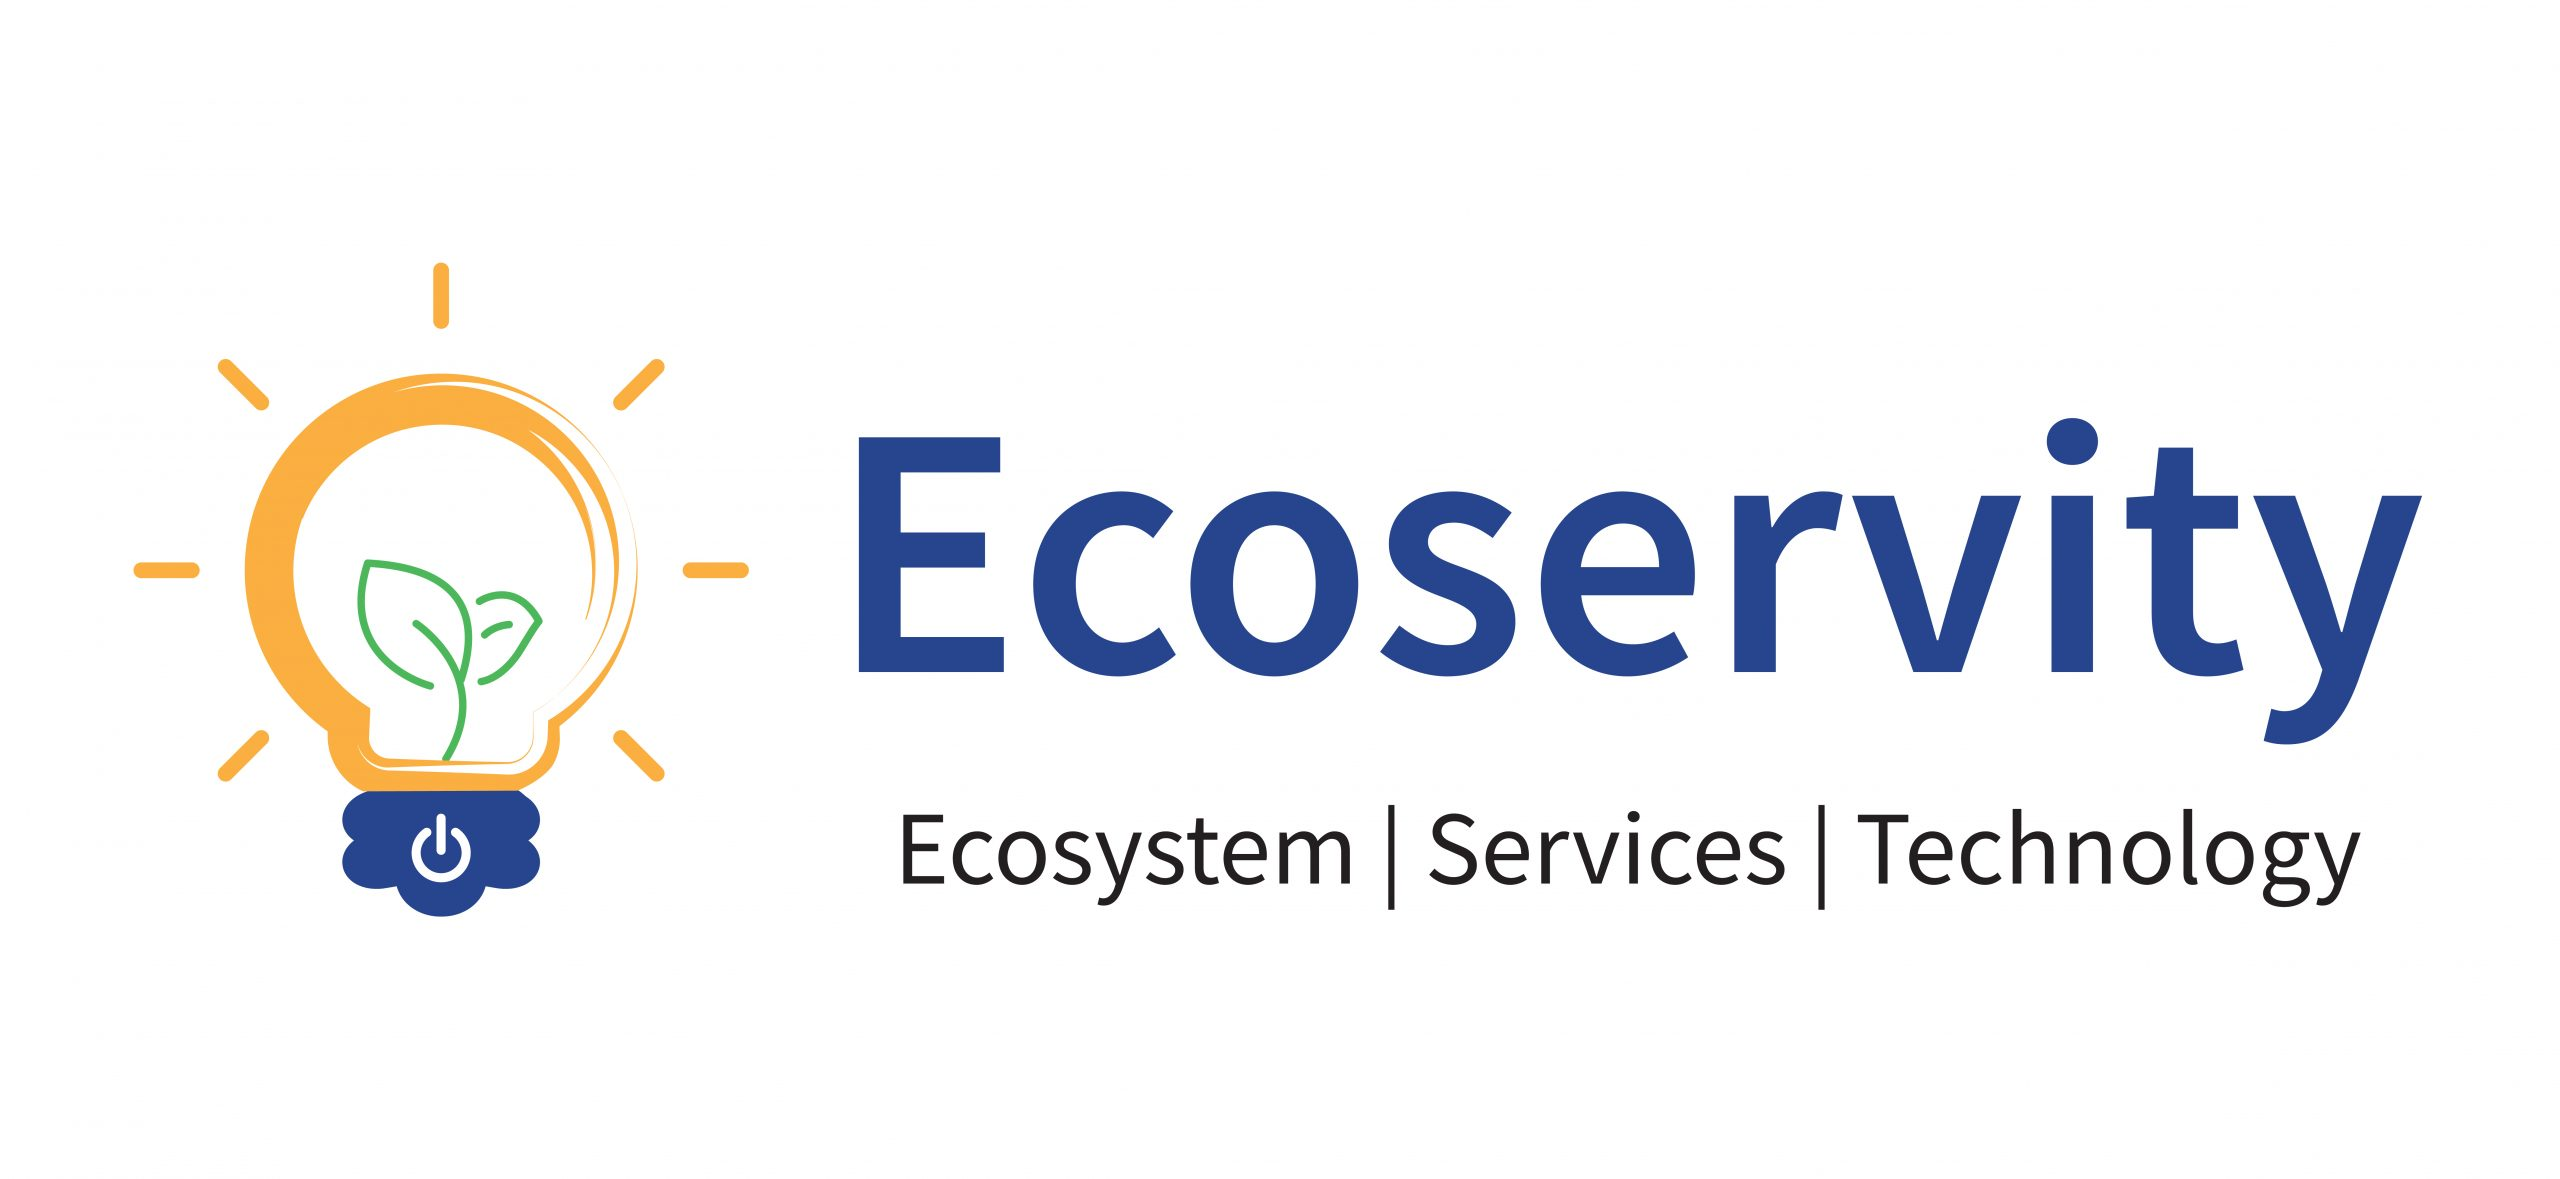 Ecoservity